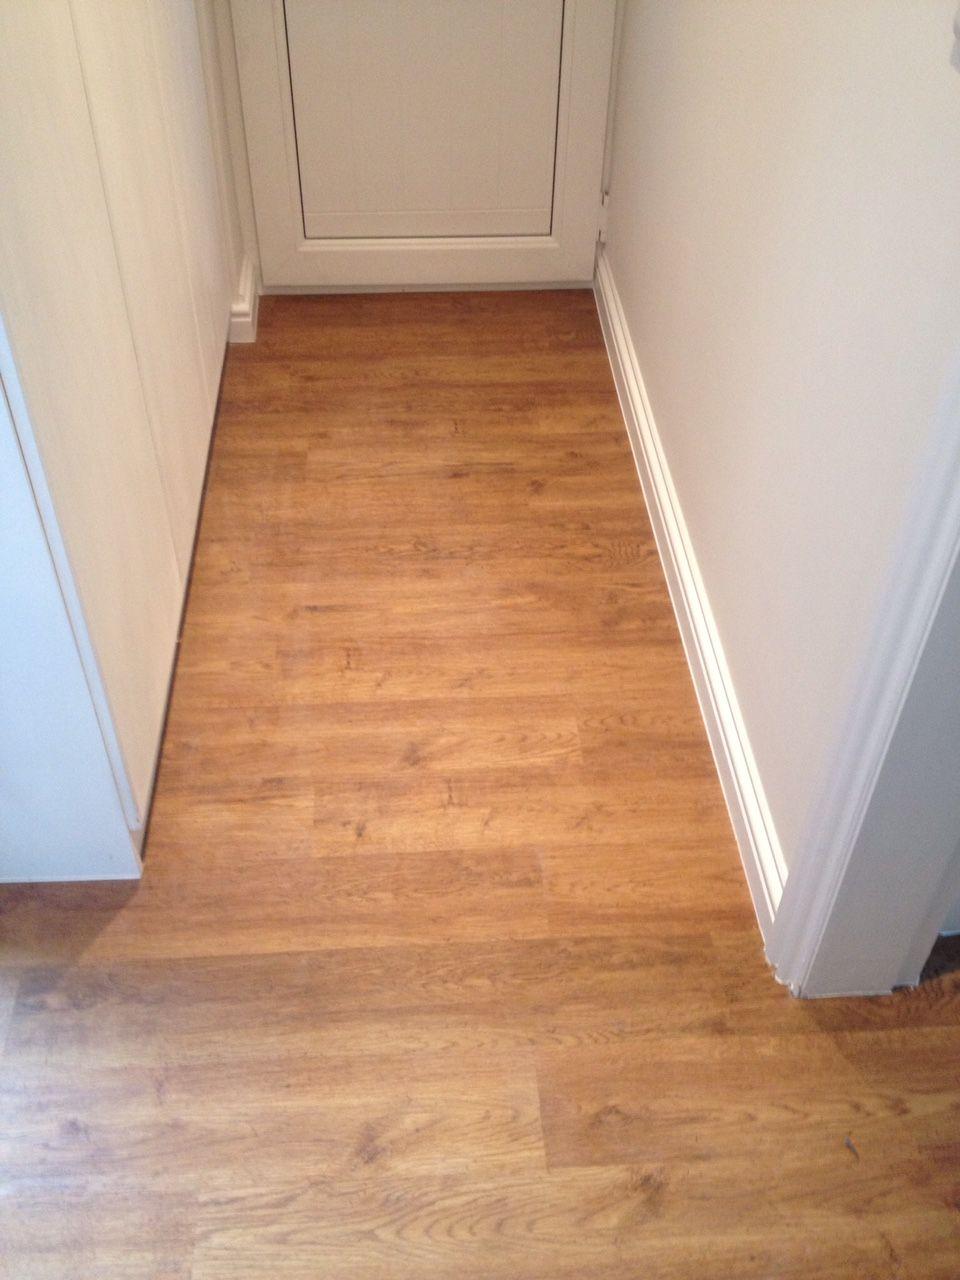 Polyflor camaro vintage timber luxury vinyl tile flooring wood vinyl tile woodstone effect floor dailygadgetfo Image collections